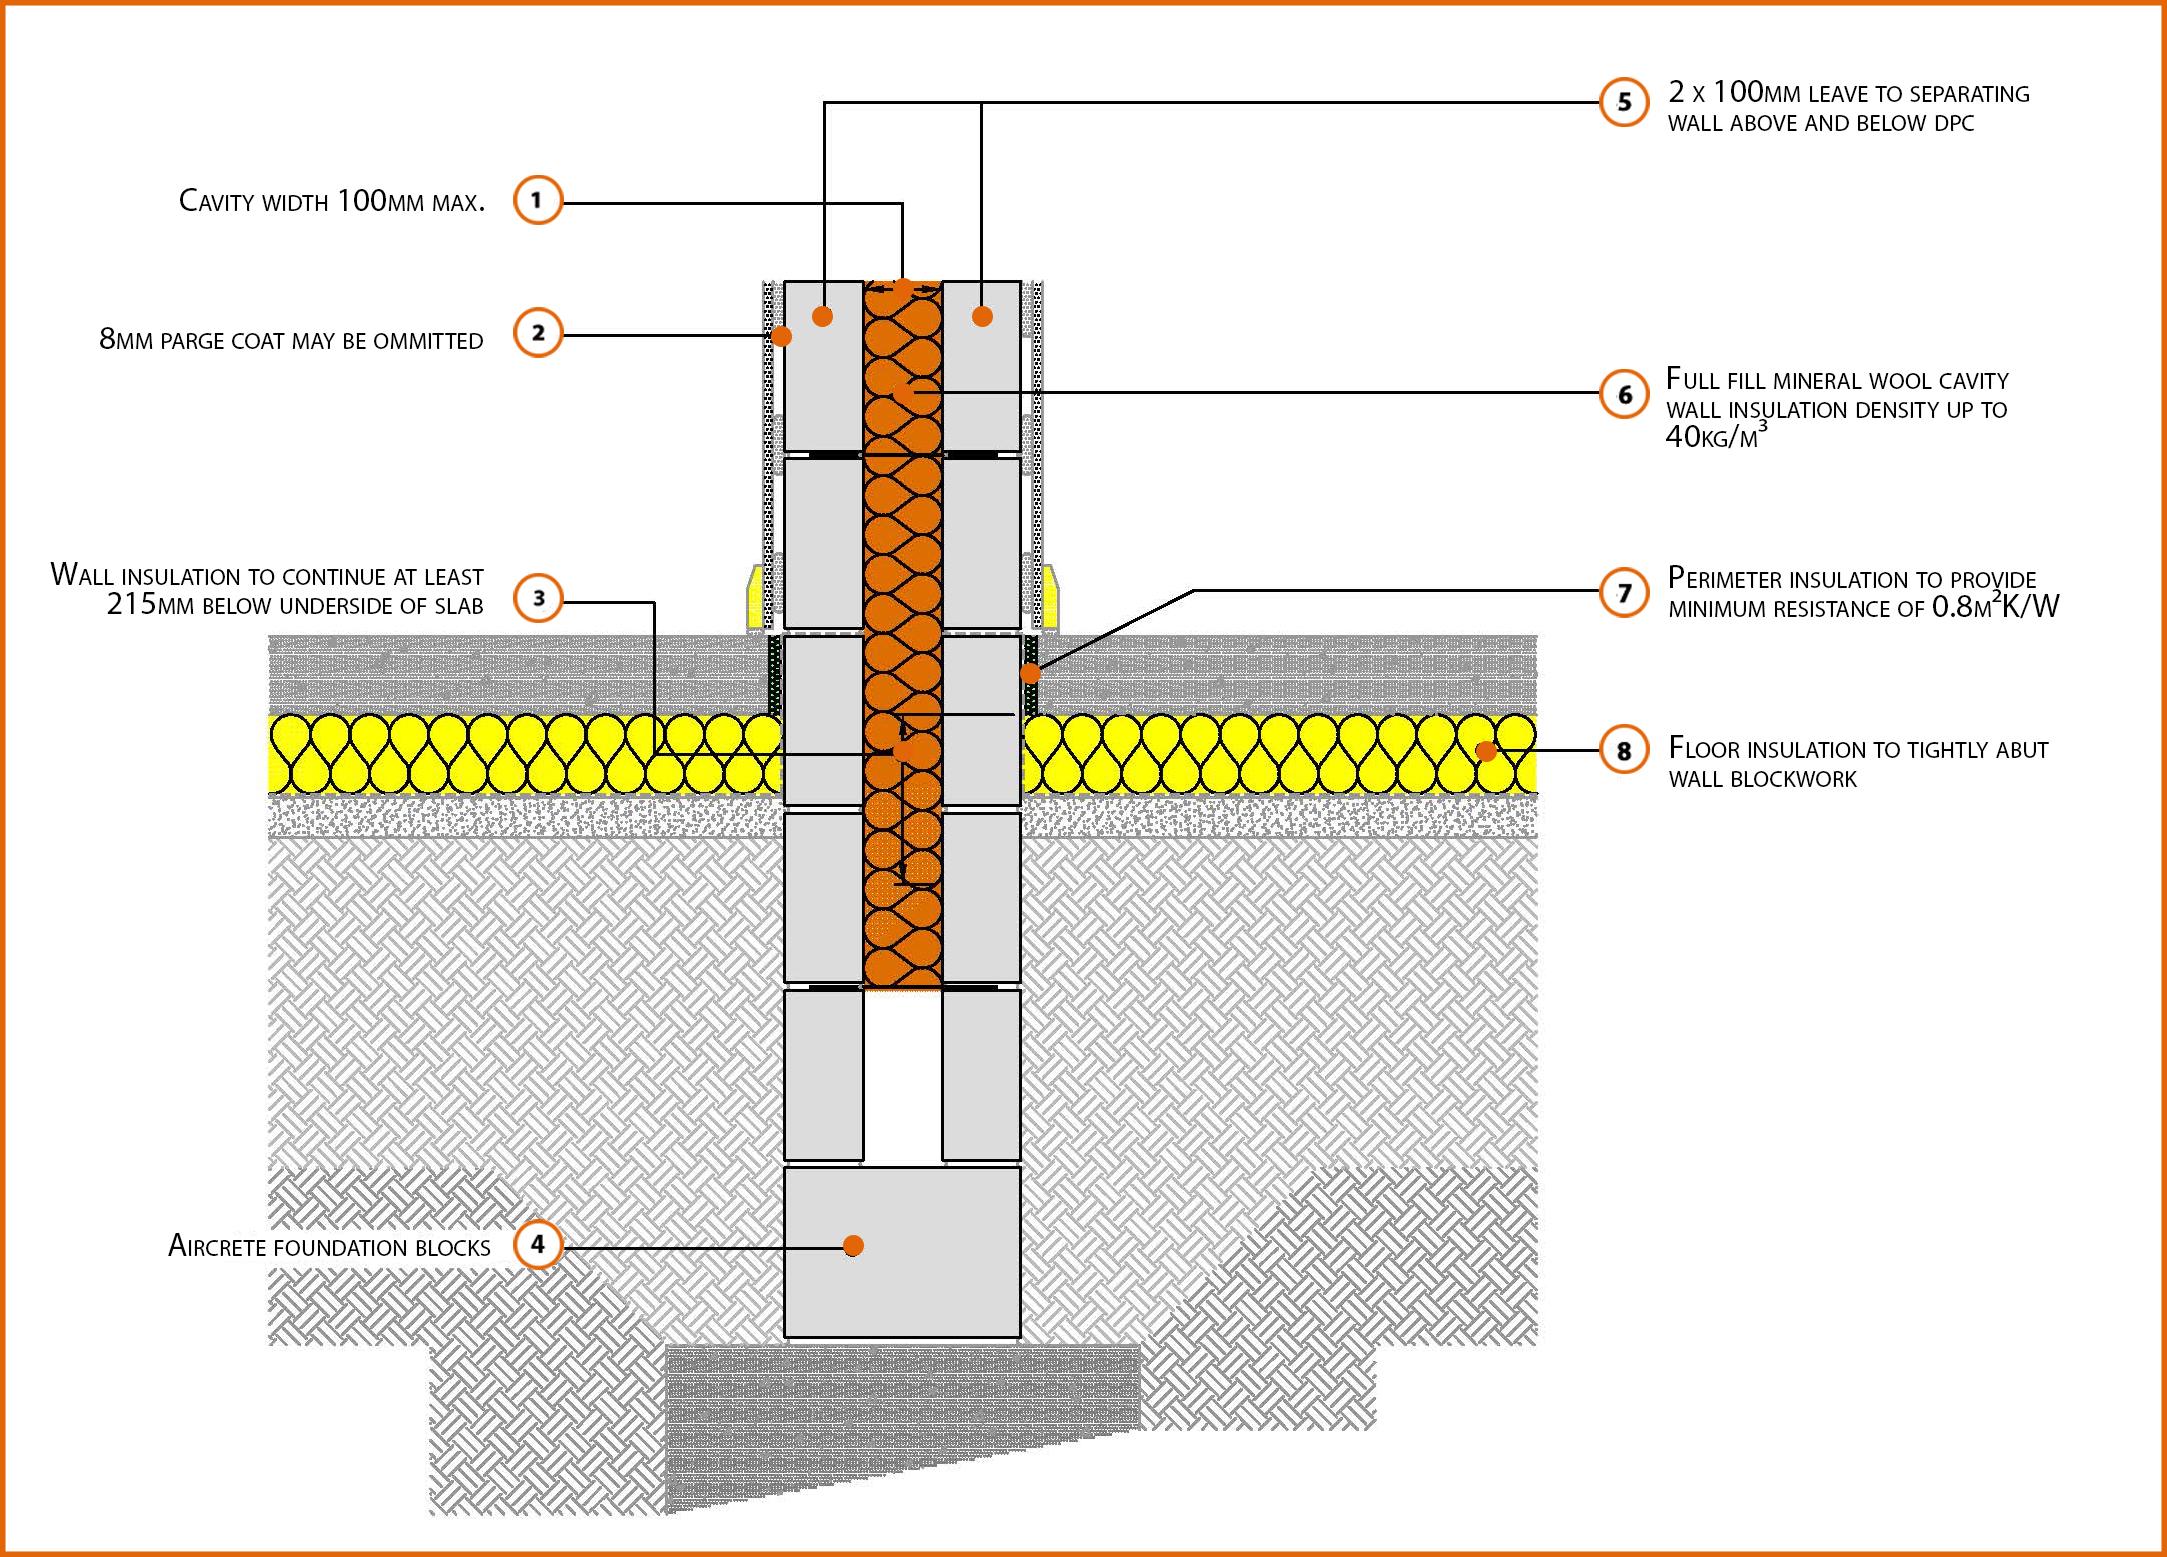 P1pcff5 In Situ Concrete Ground Bearing Floor Insulation